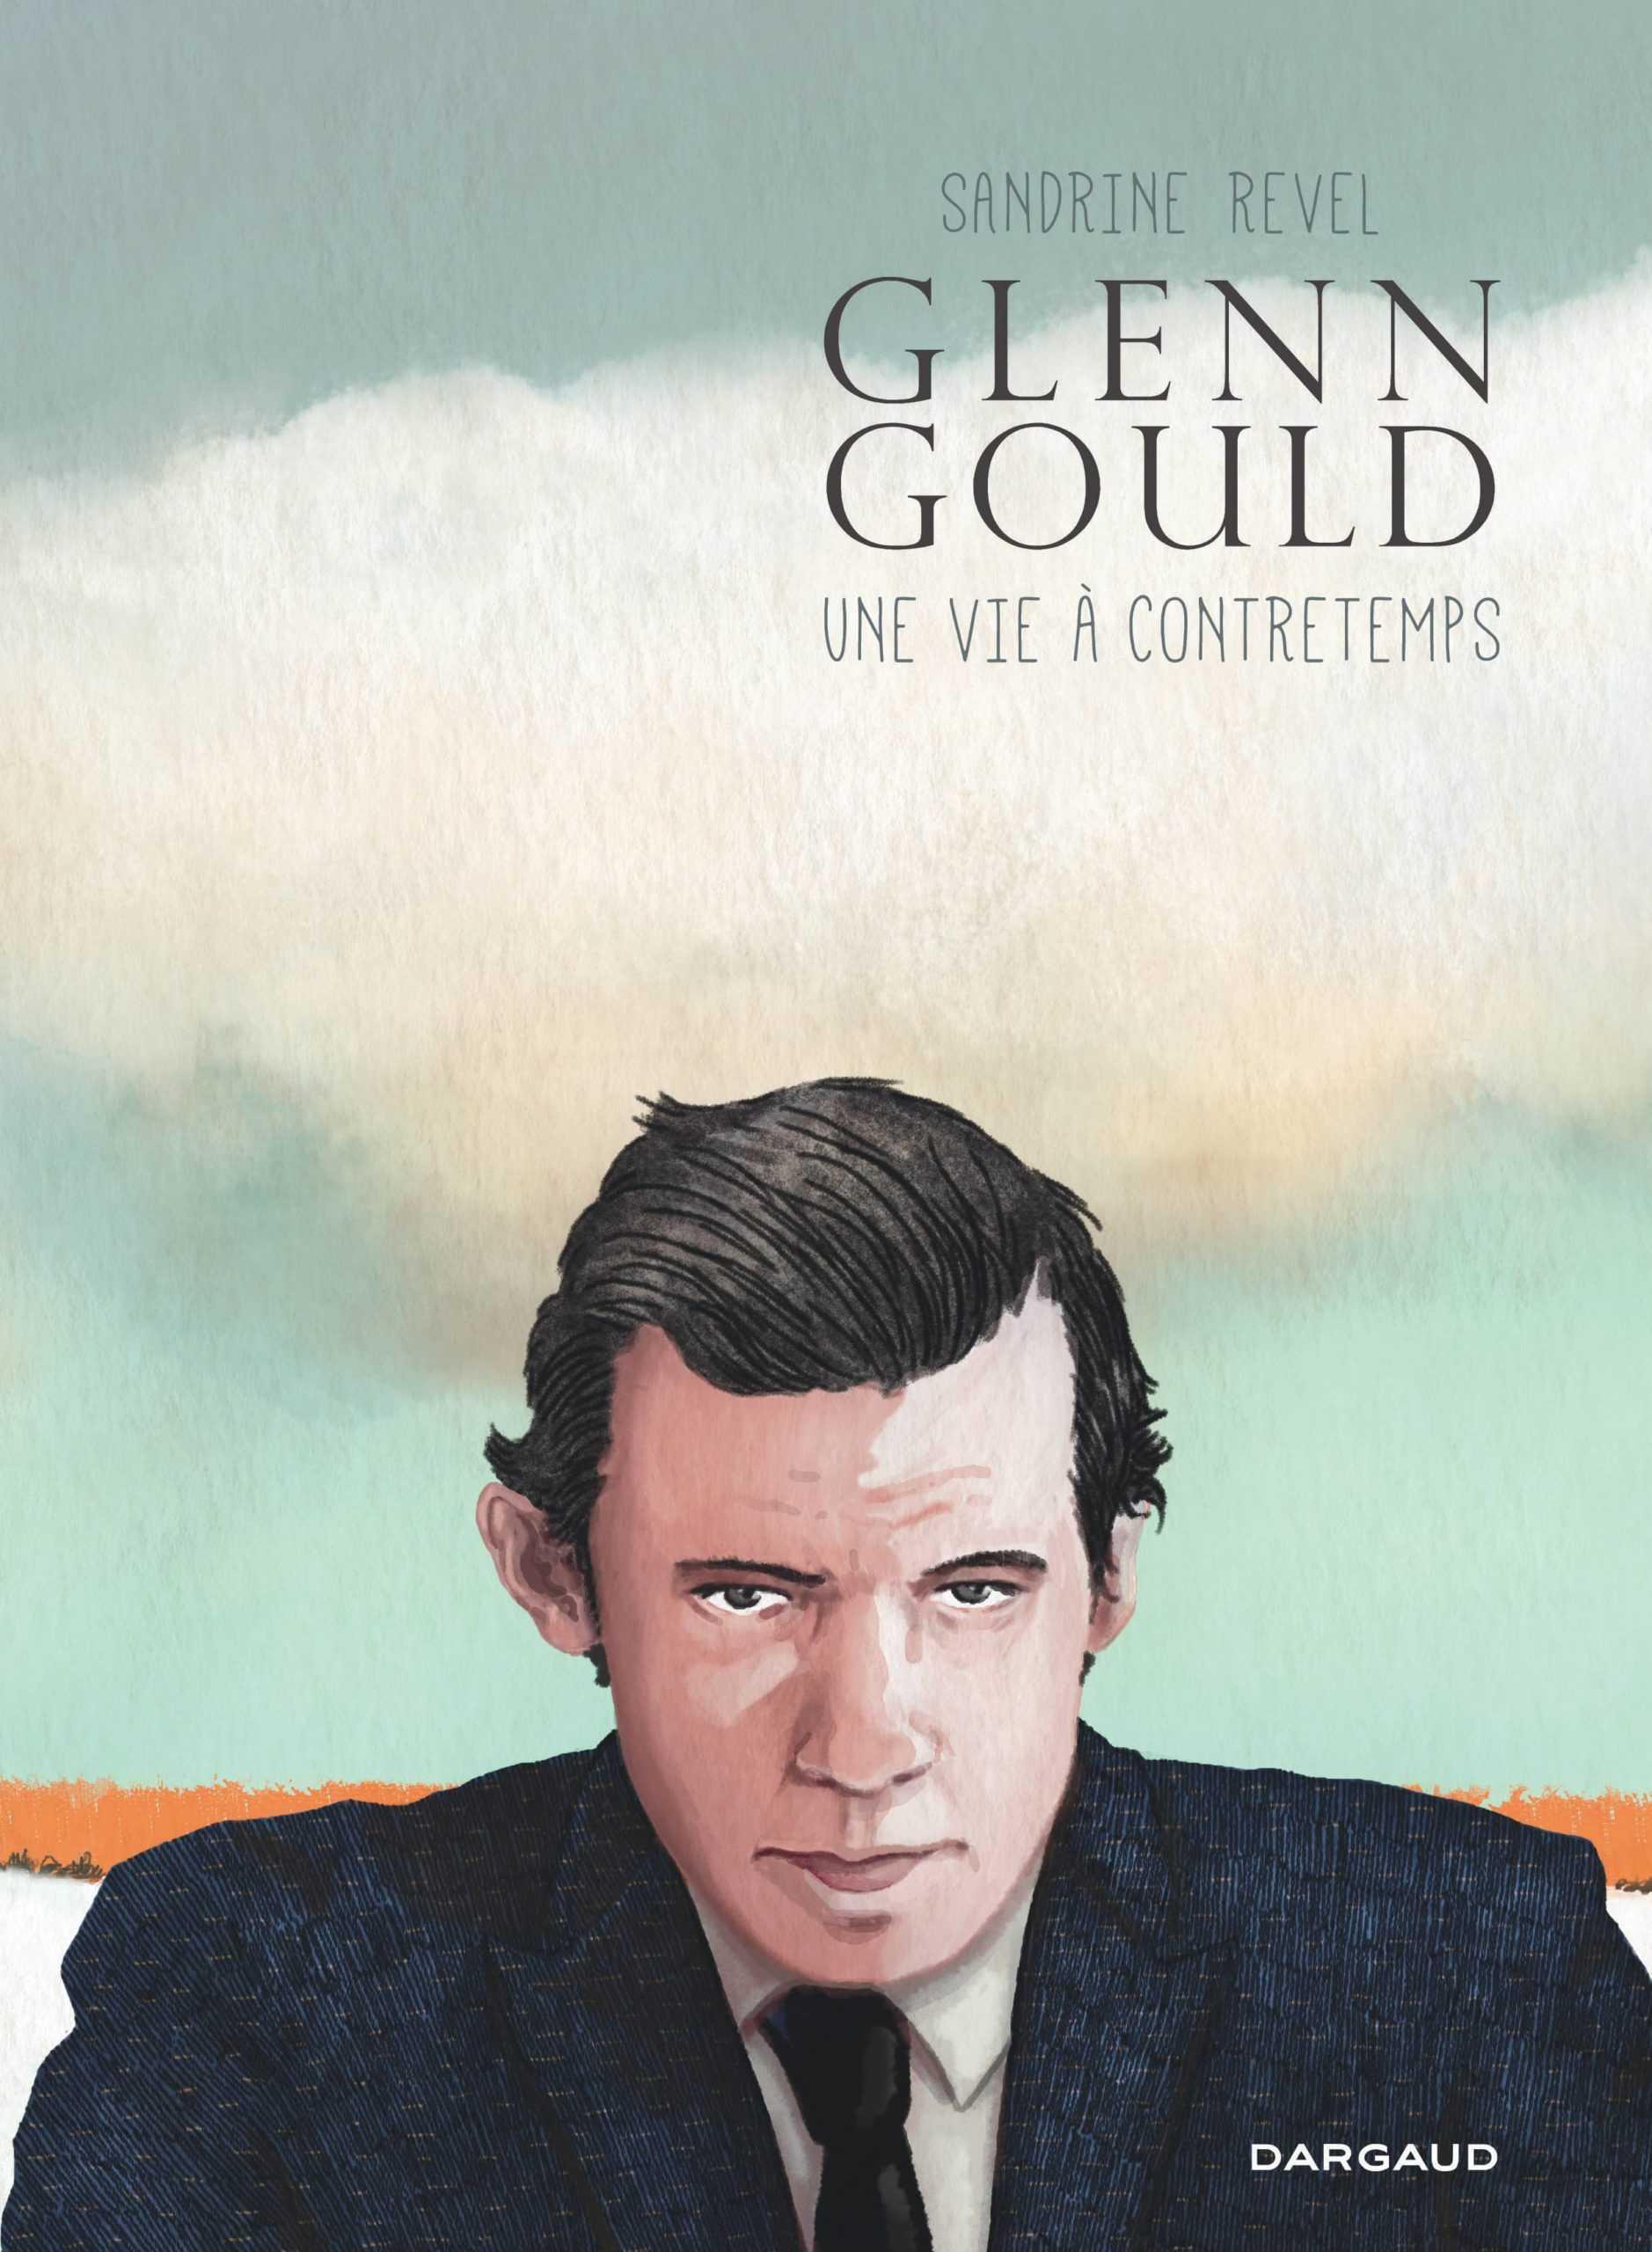 Sandrine Revel Prix Artémisia 2016 pour Glenn Gould